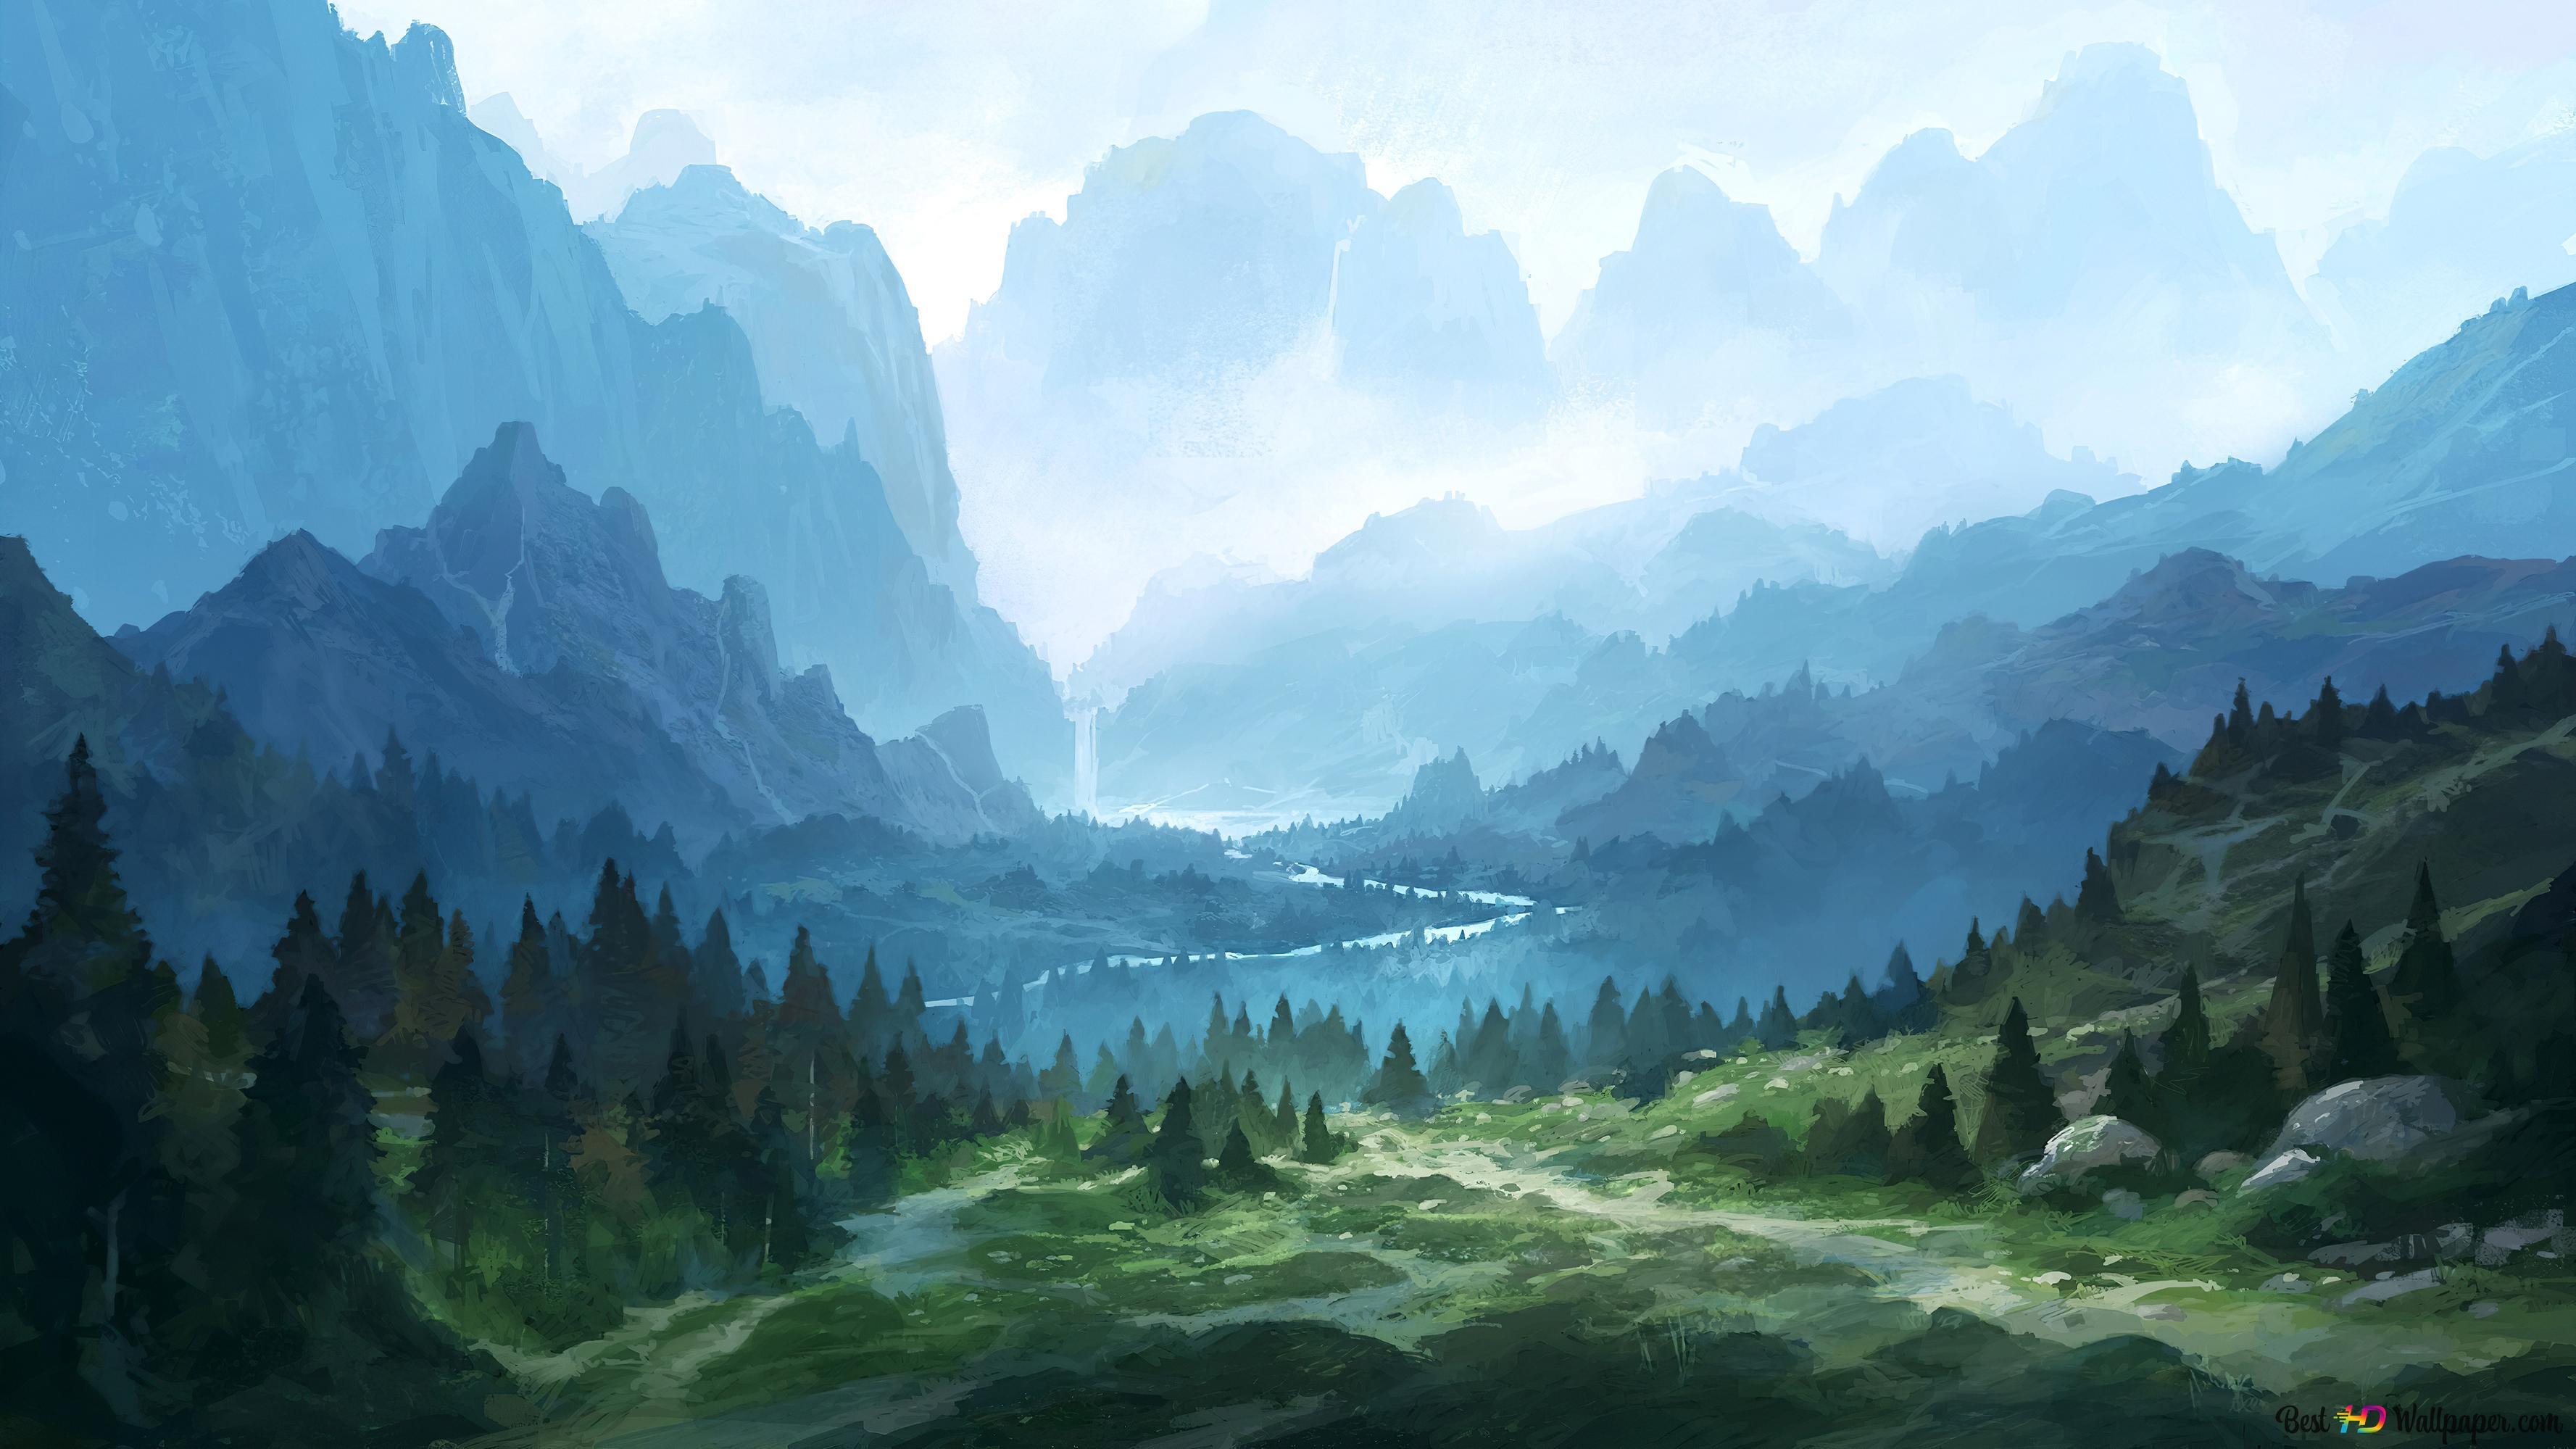 pemandangan artistik gunung hijau wallpaper 3554x1999 55129 53